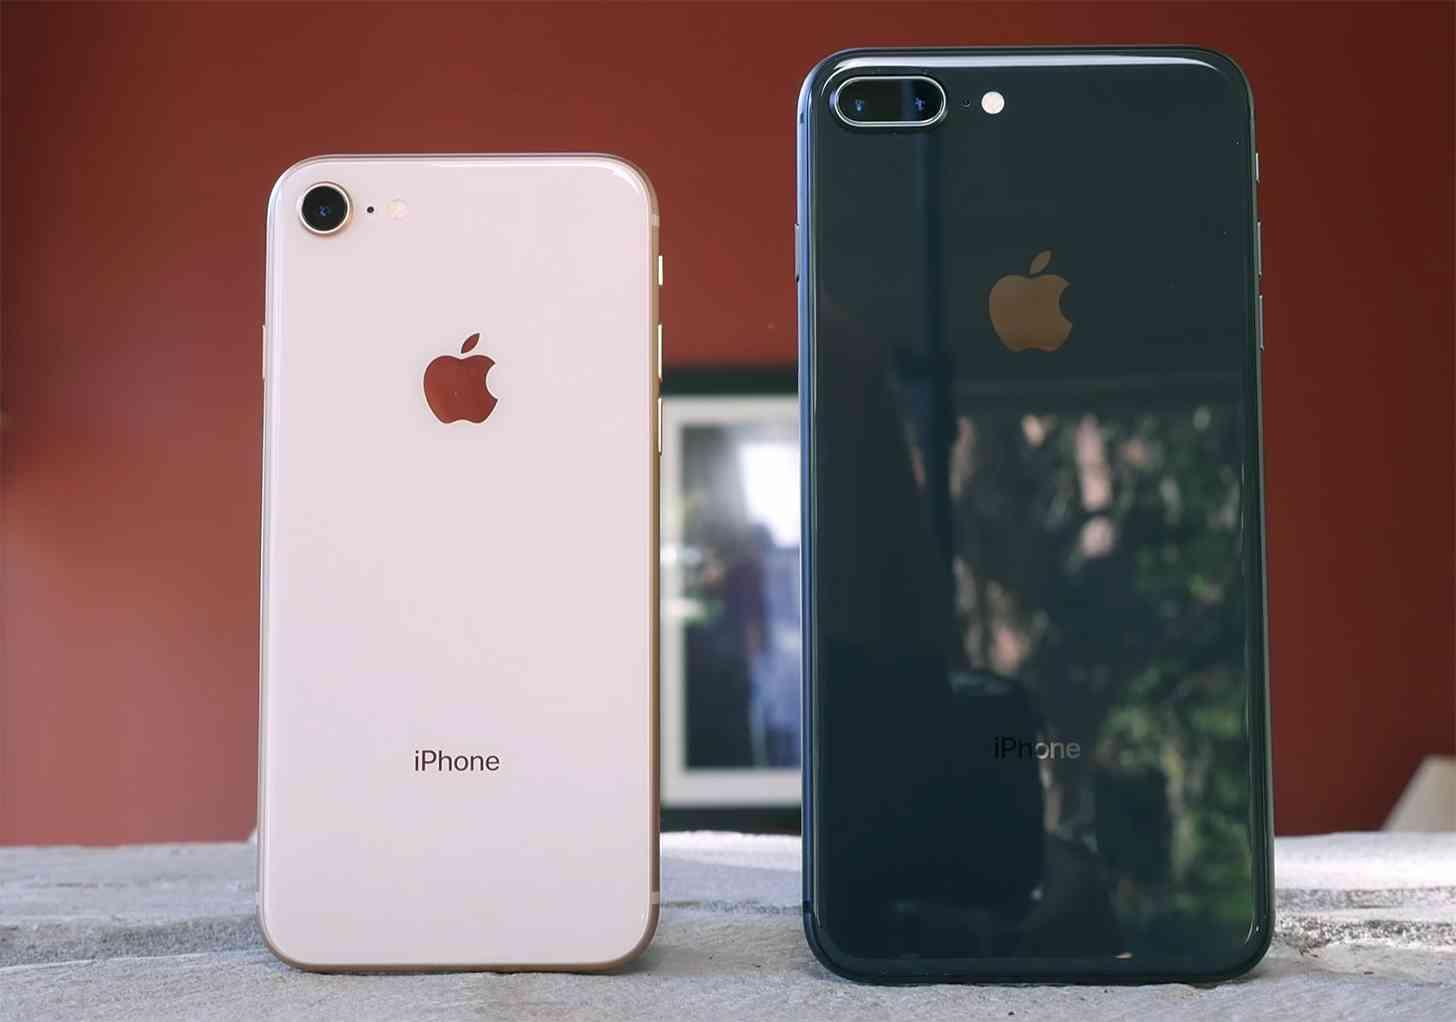 iPhone 8 and iPhone 8 Plus comparison